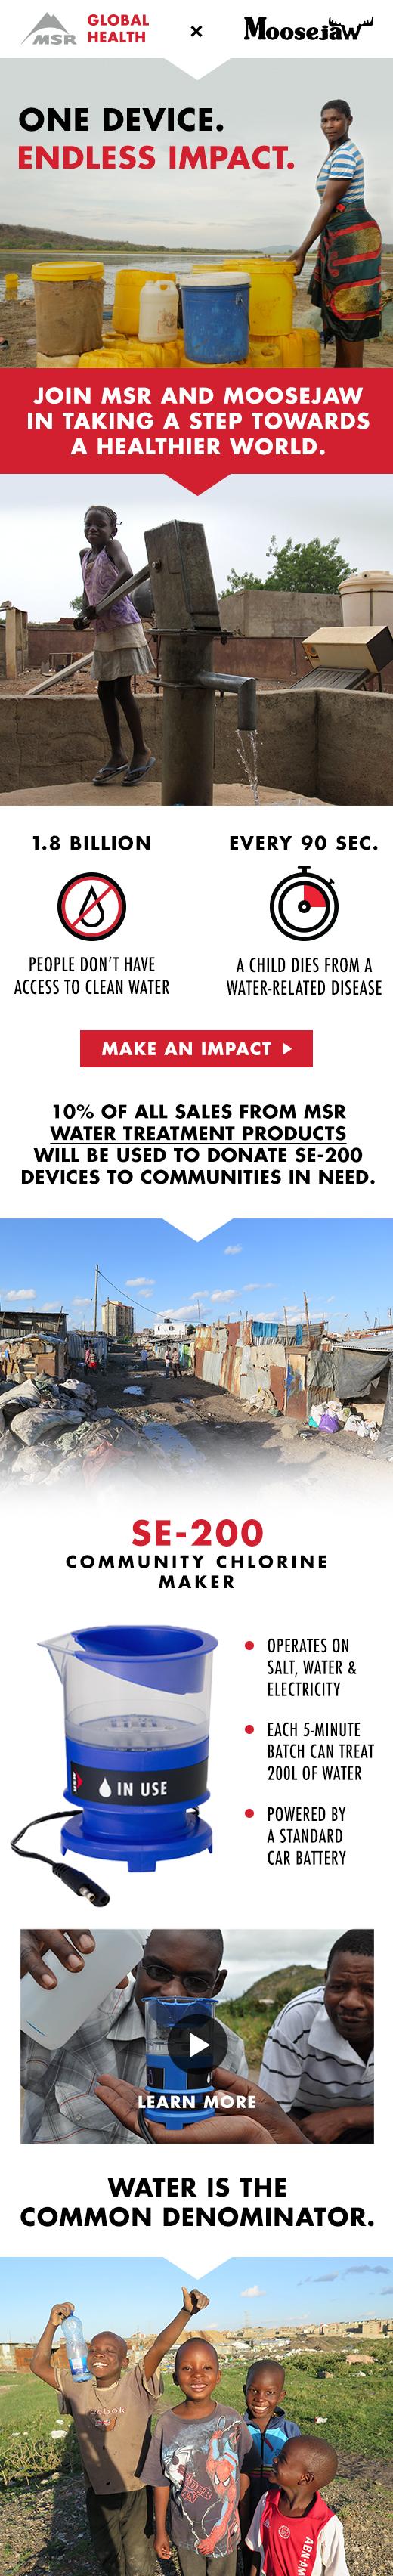 MSR-Global-Health-Mailer-4-21-17.jpg